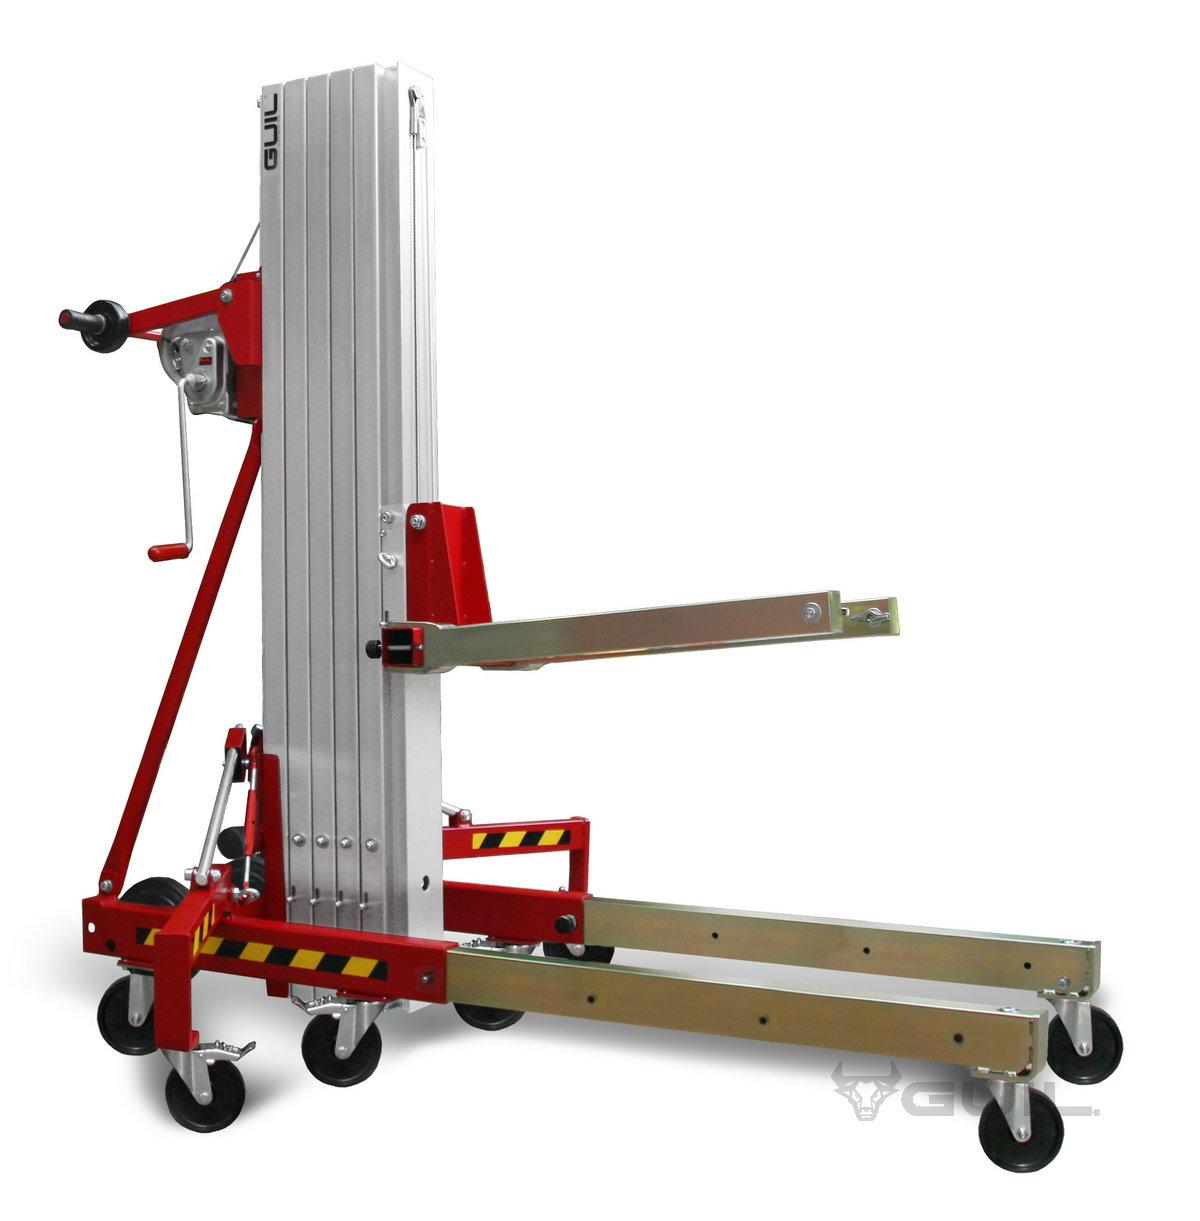 Kanaallift 6,60 m 230 kg (dutch) (1)